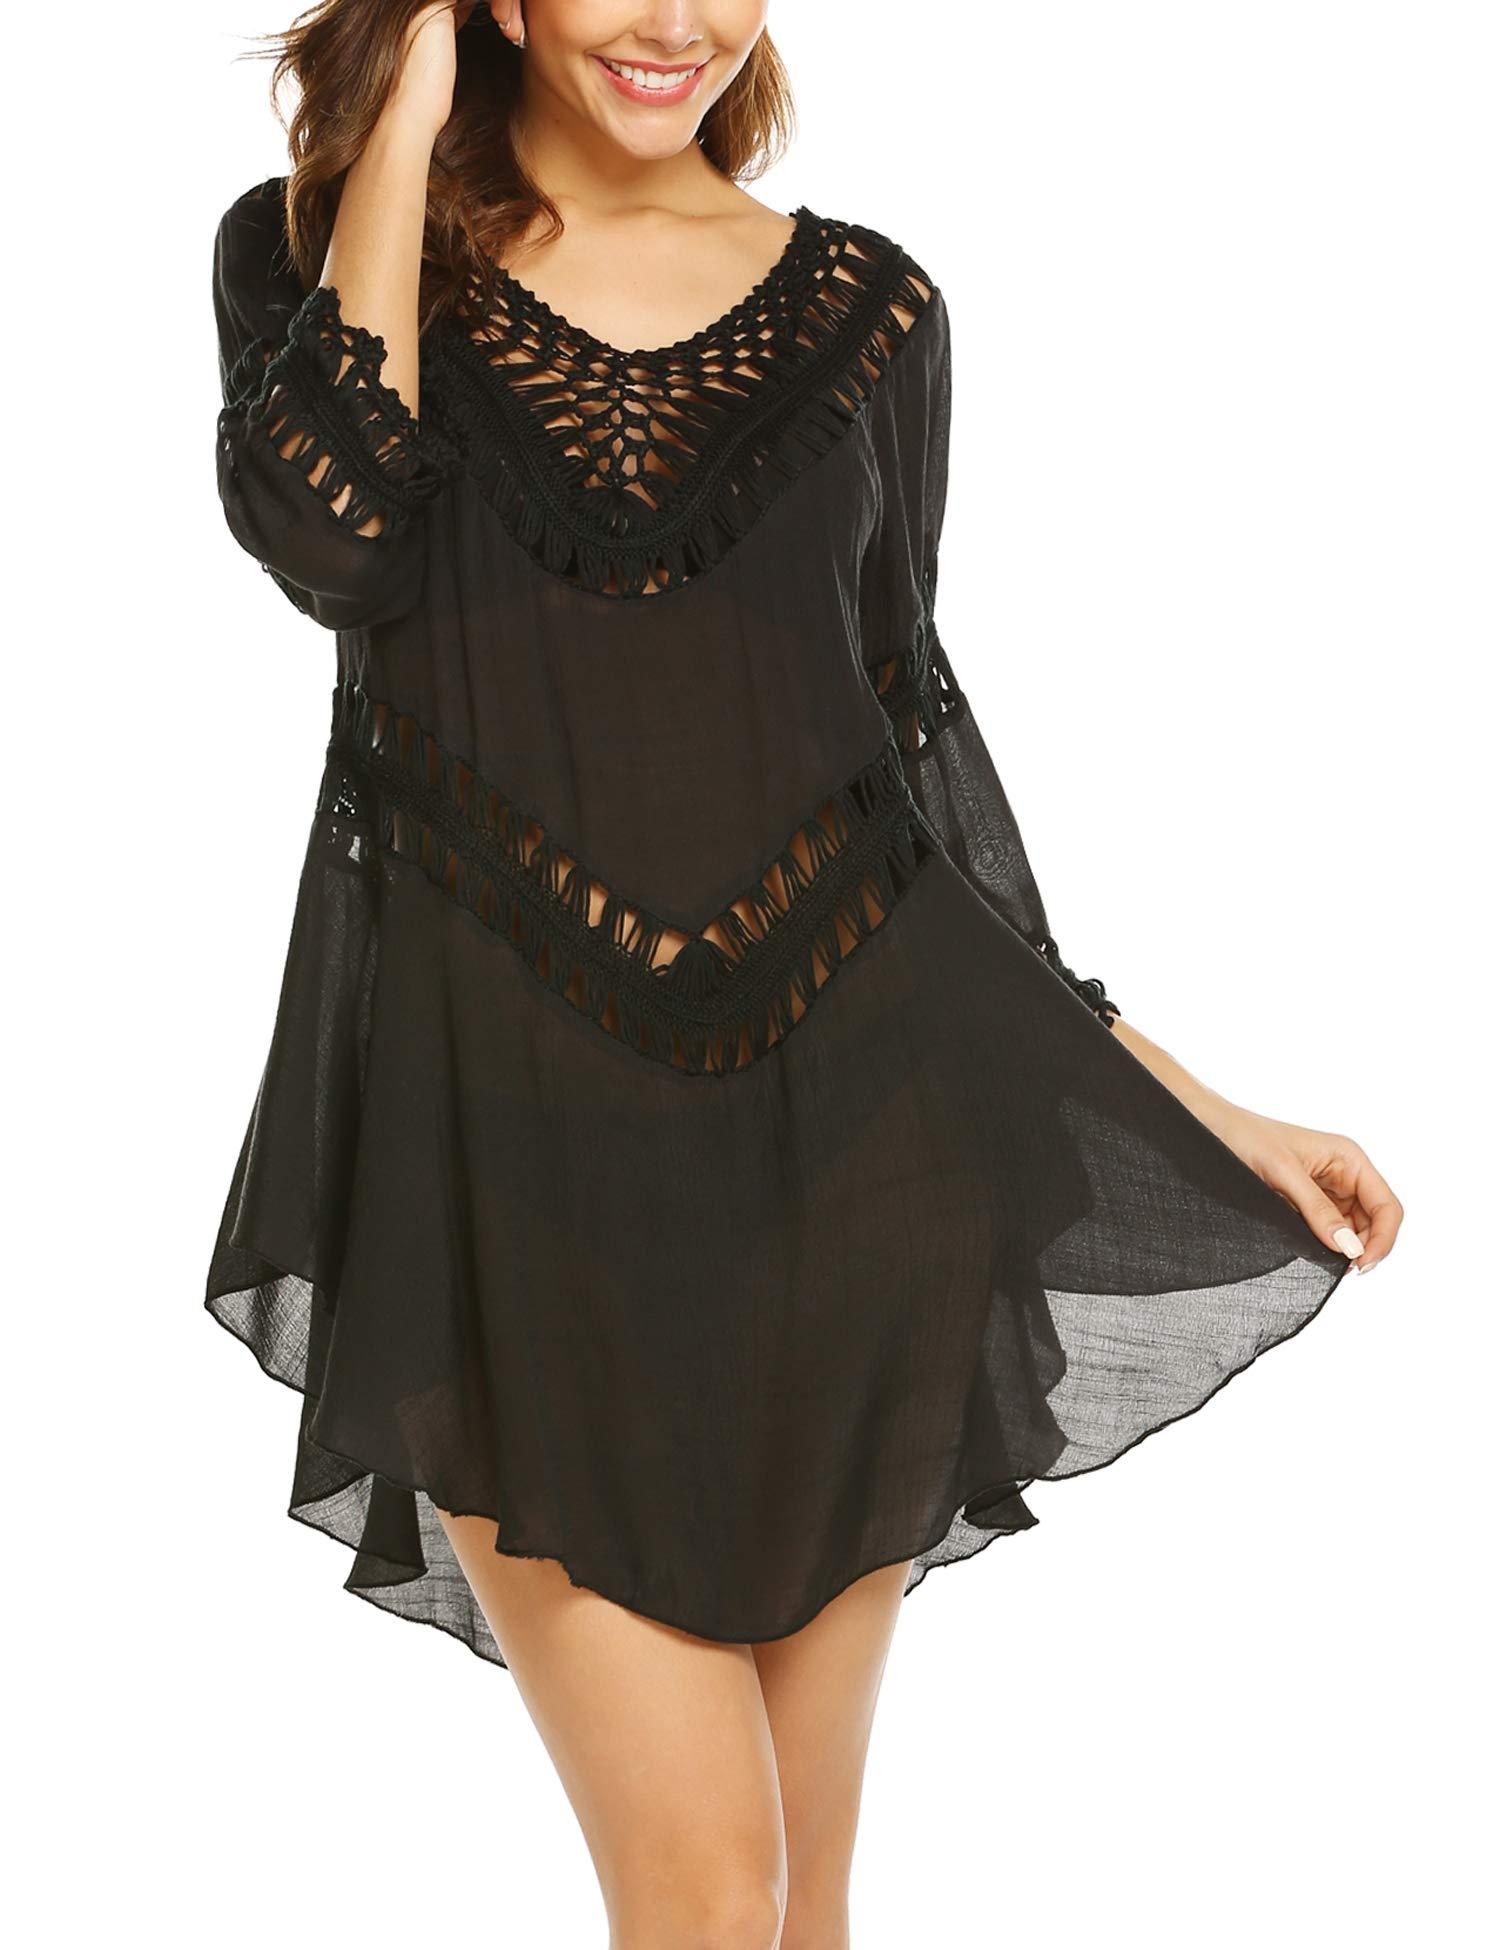 ELOVER Women Bikini Cover Ups Chiffon Coverups Crochet Smock Hollow Out Beach Dress